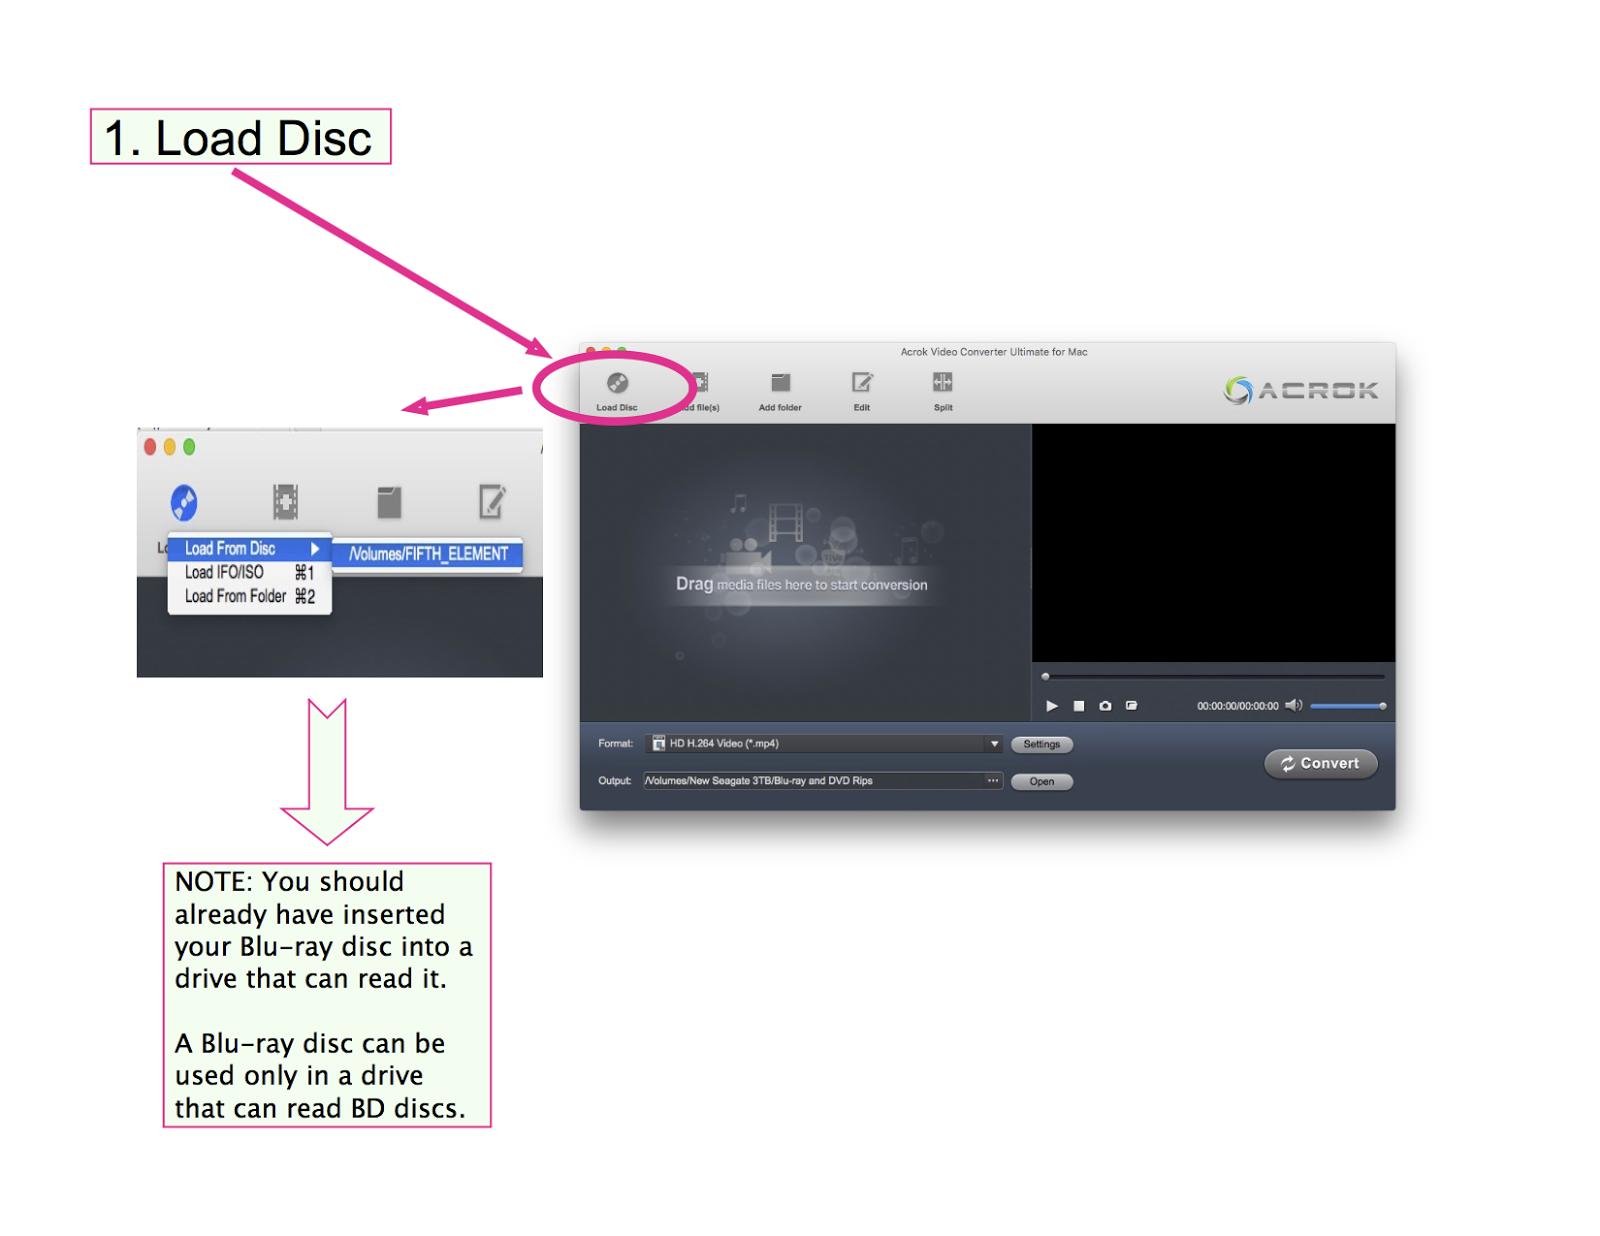 acrok video converter ultimate for mac